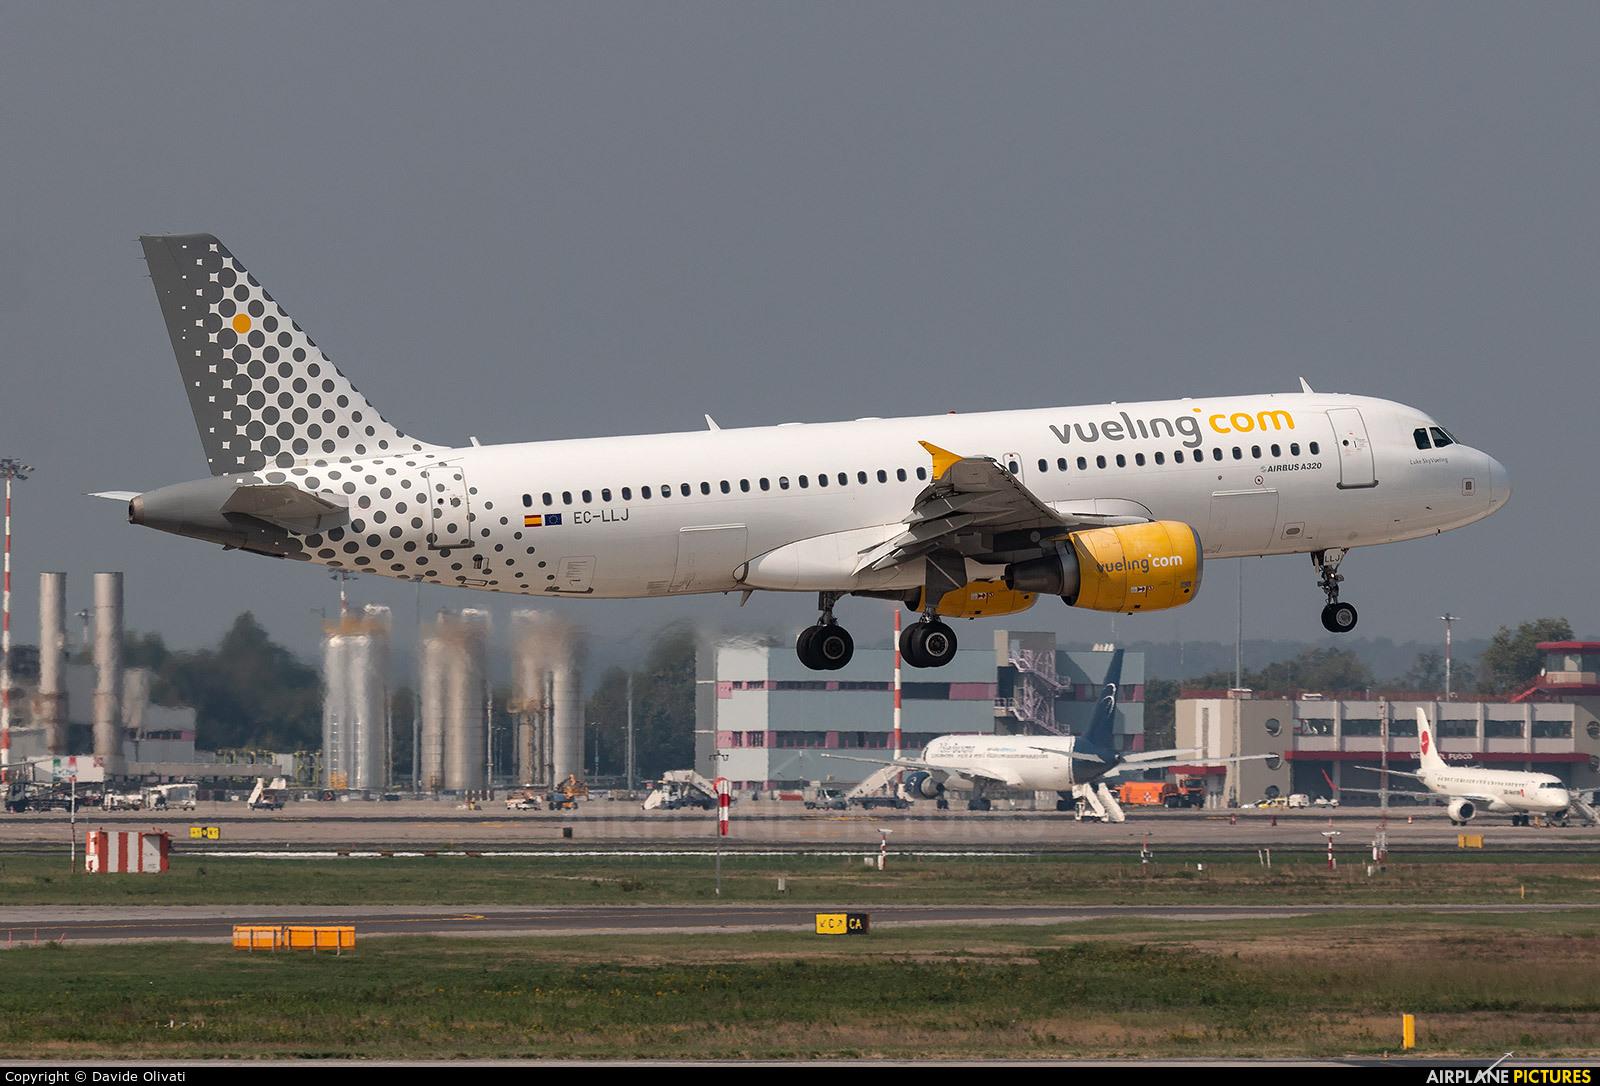 Vueling Airlines EC-LLJ aircraft at Milan - Malpensa